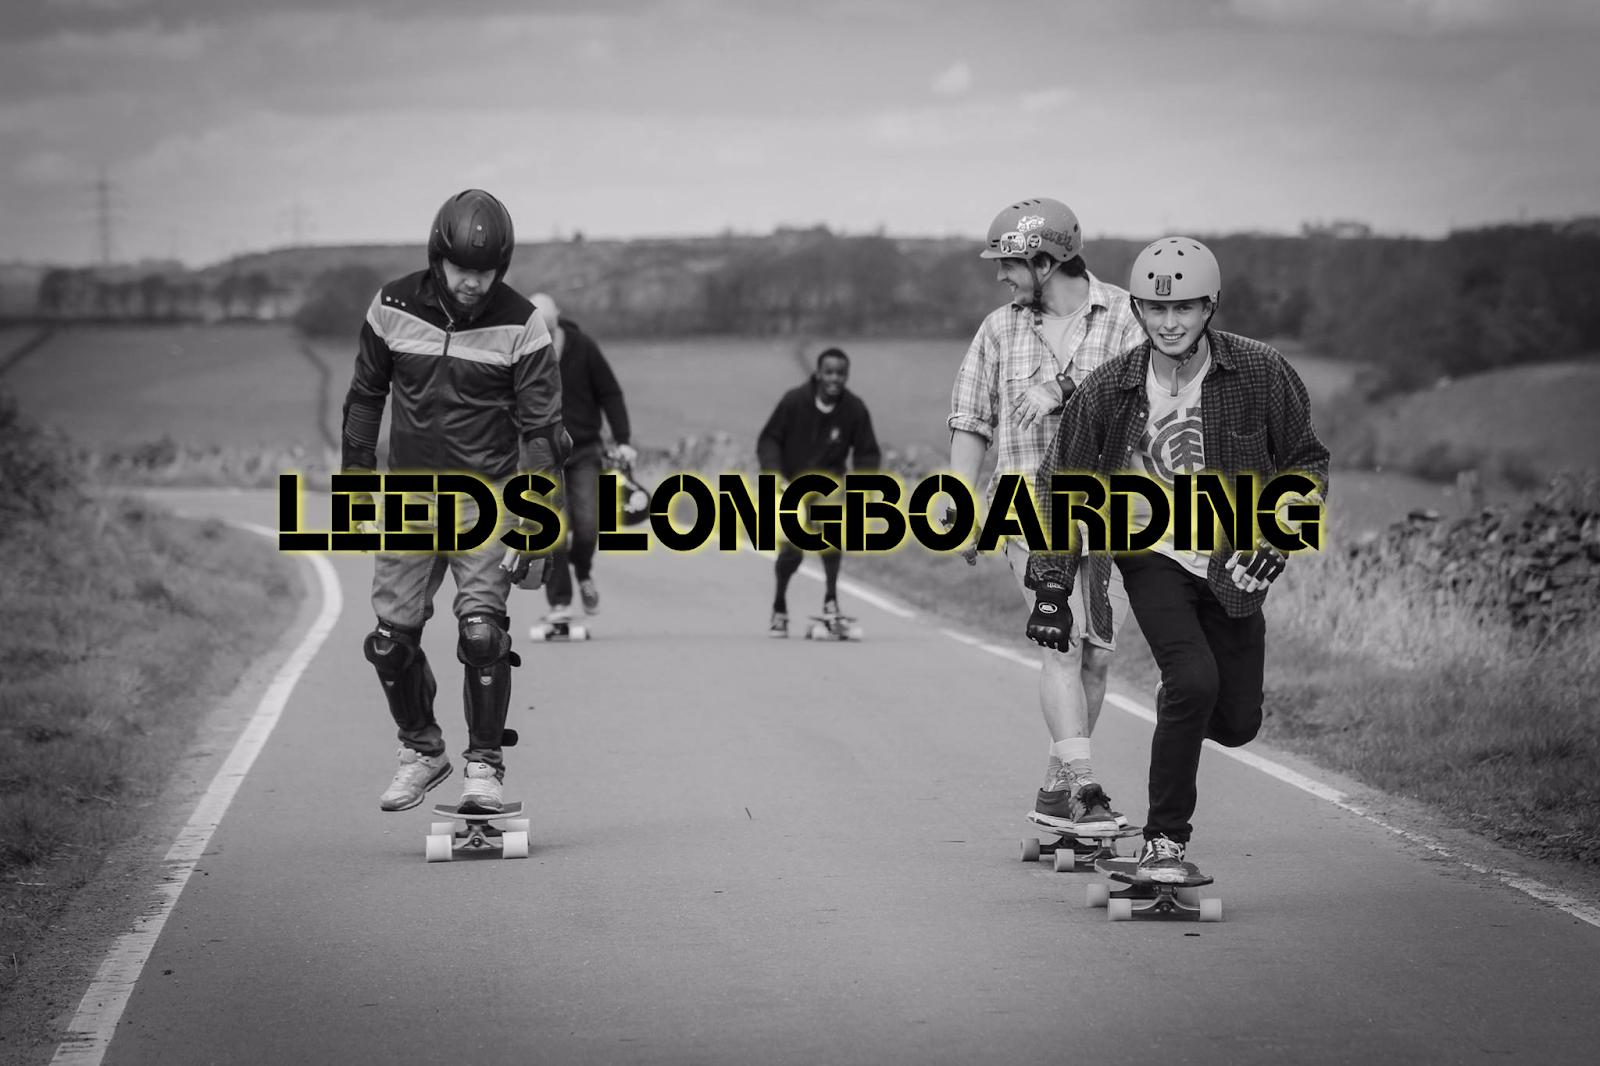 leeds longboarding community